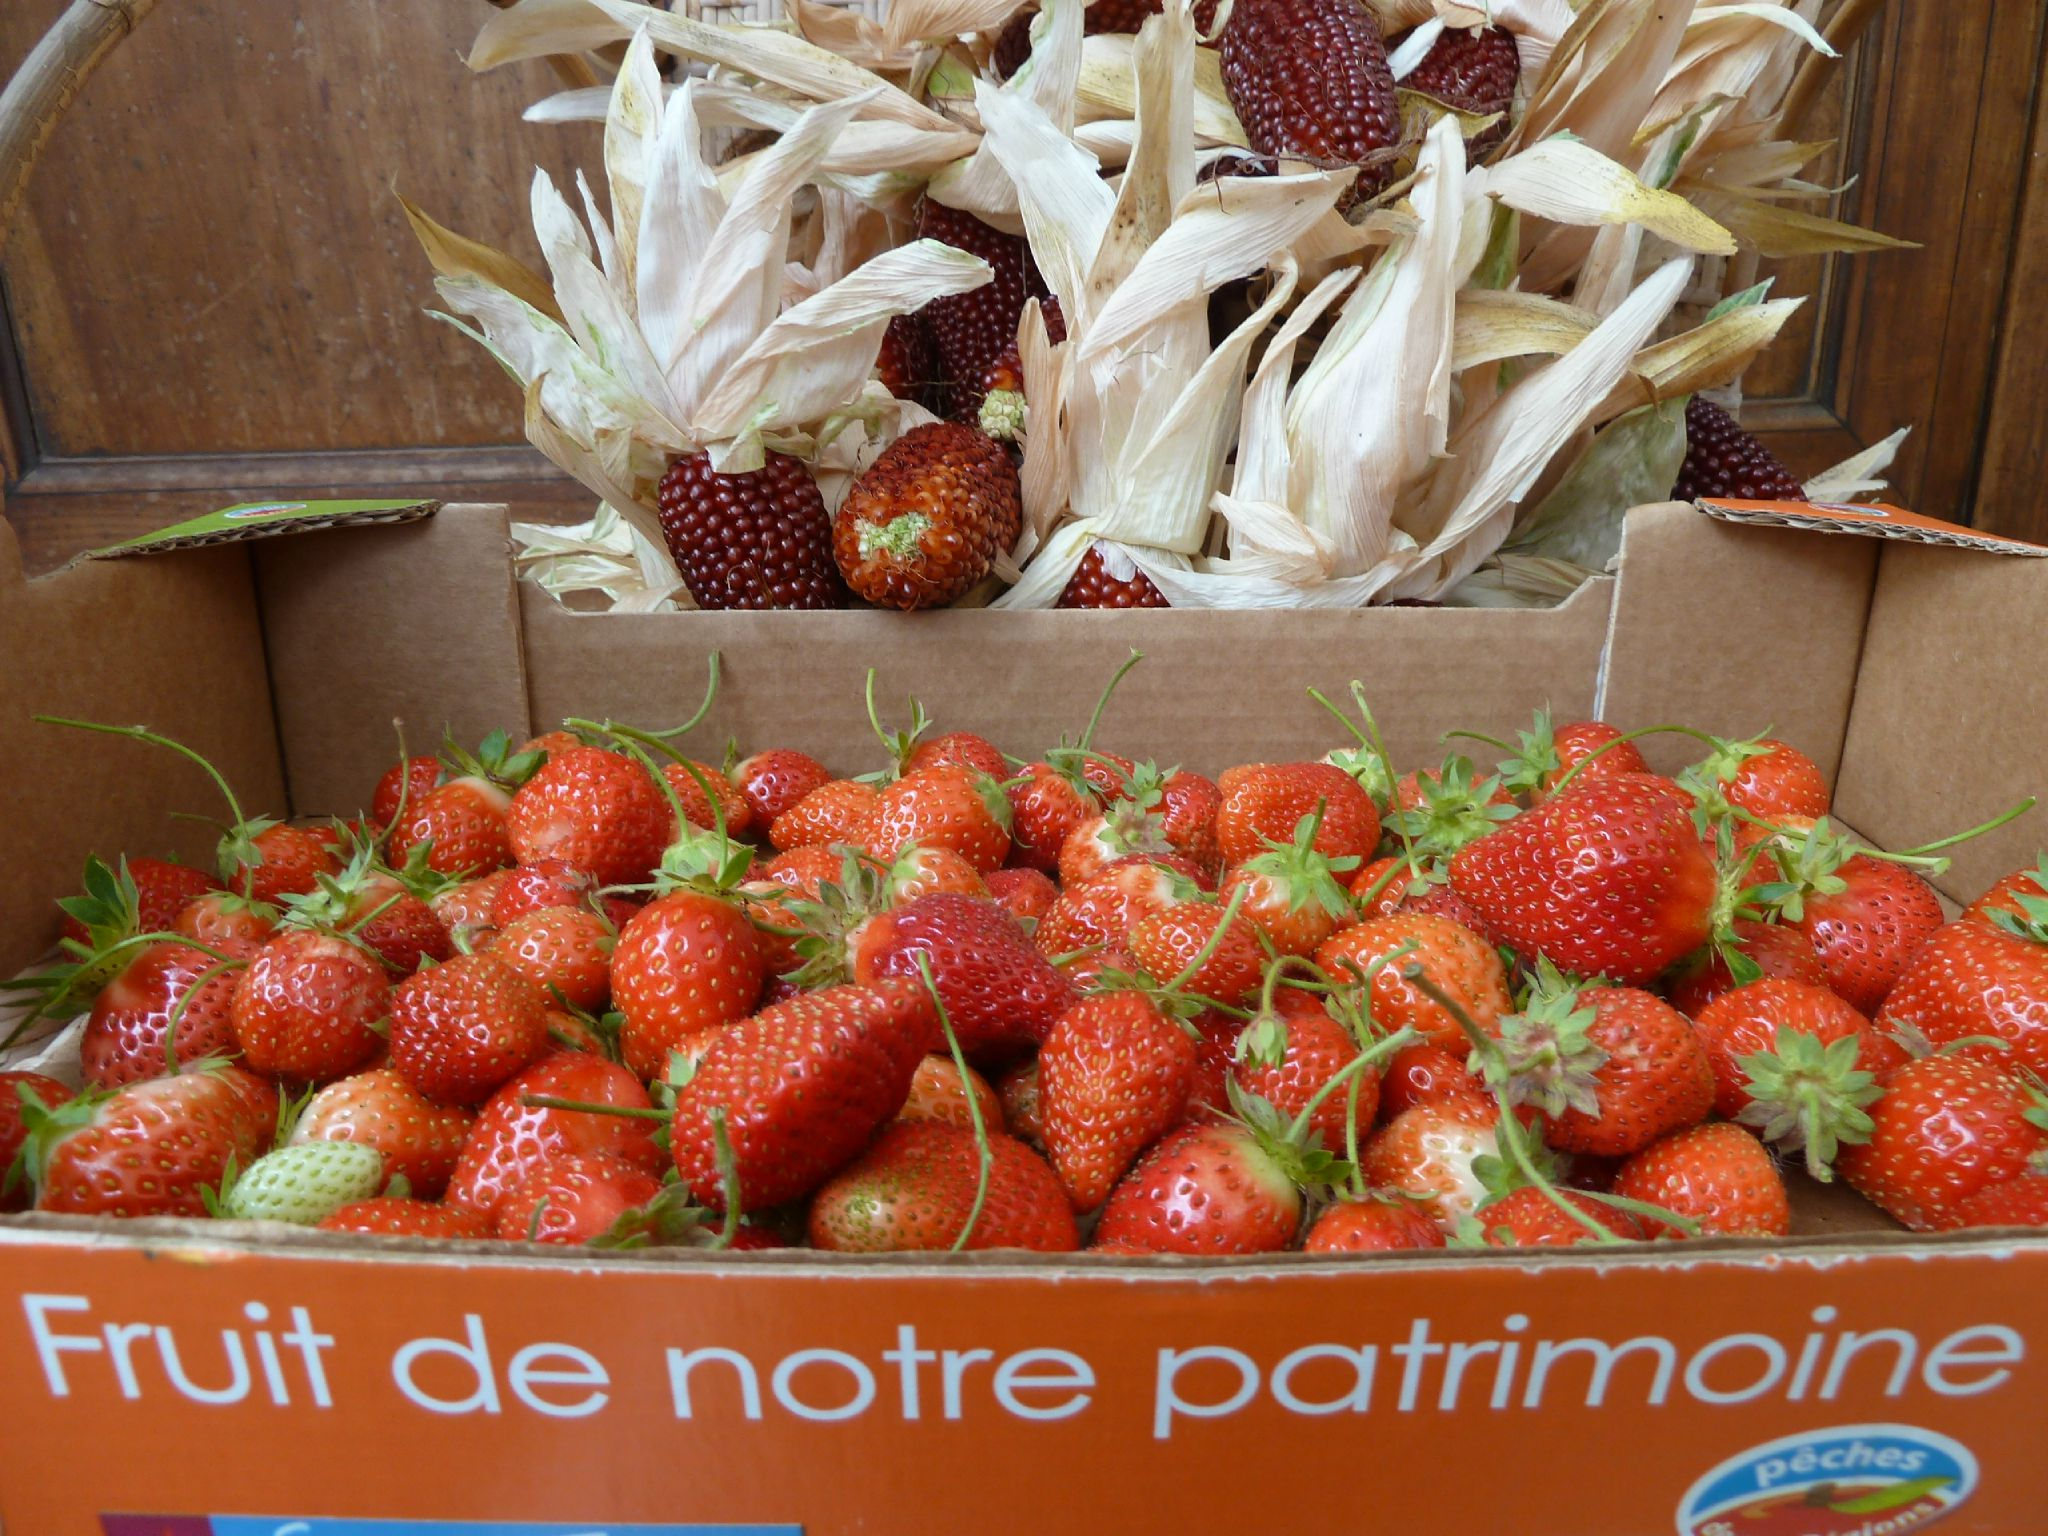 fraises de septembre - www.passionpotager.canalblog.com